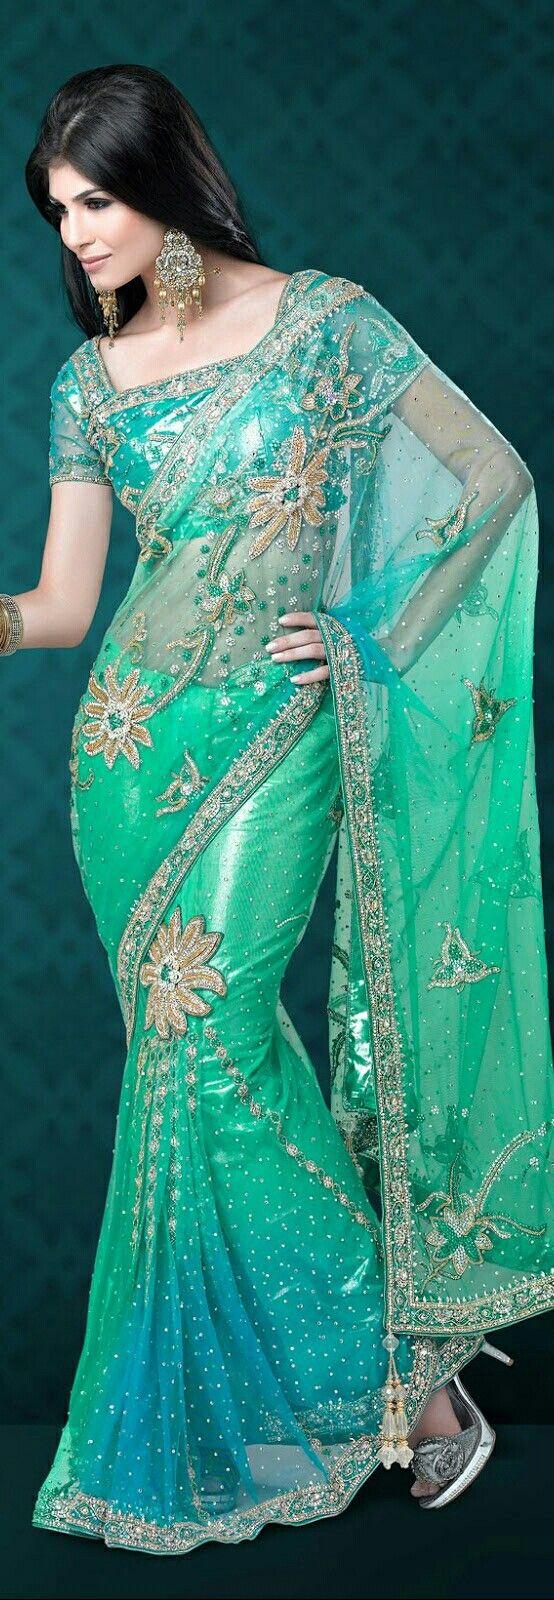 Photo of Sea Green & Turquoise w. Underwater Theme Wedding Saree.